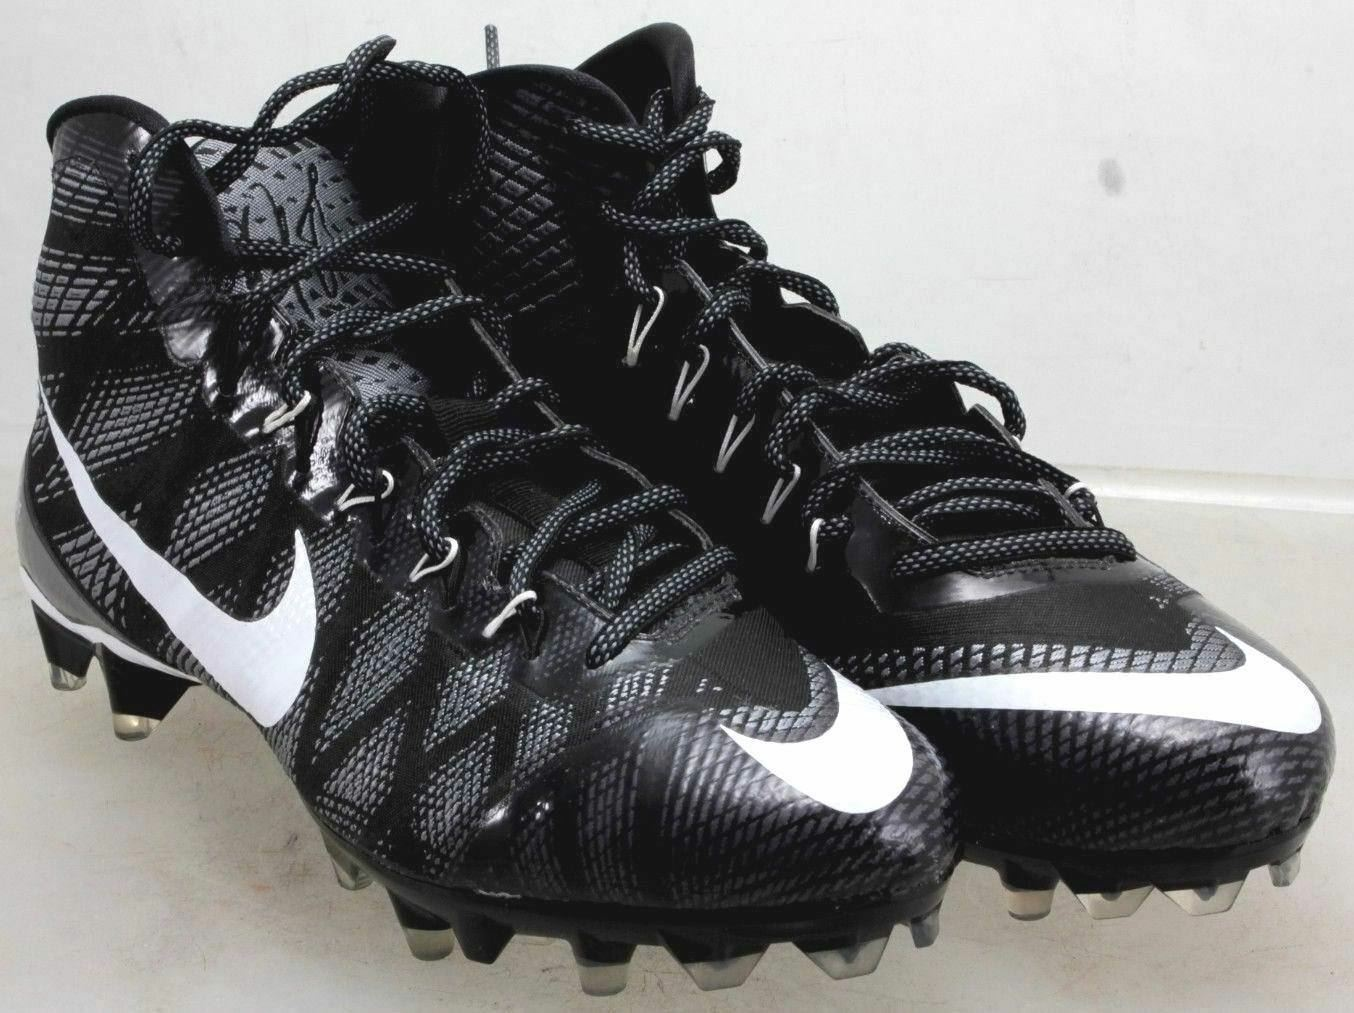 Nike cj3 flyweave uomini elite st 725226-010 football scarpette 725226-010 st noi 9,5 ed77b5